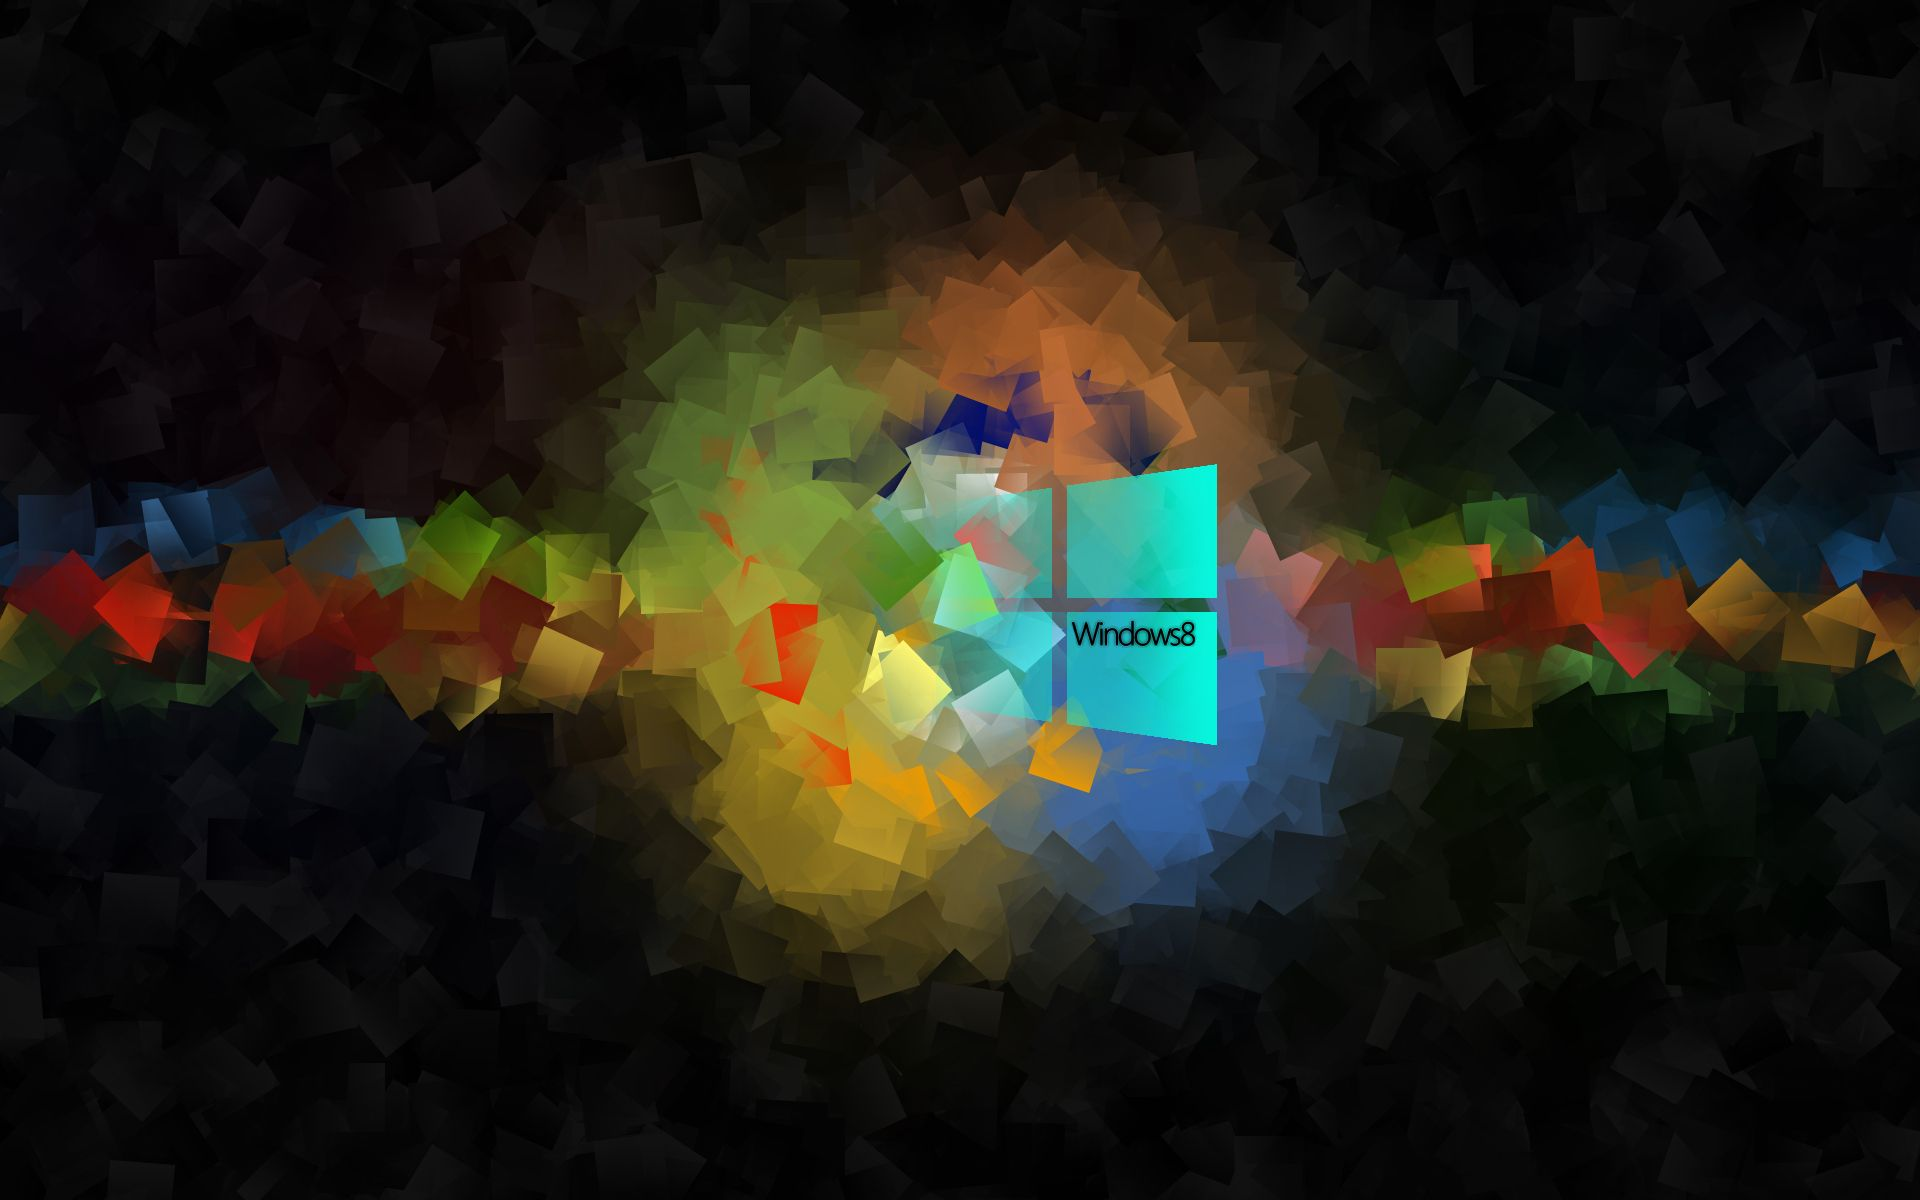 Windows Microsoft Backgrounds Wallpaper